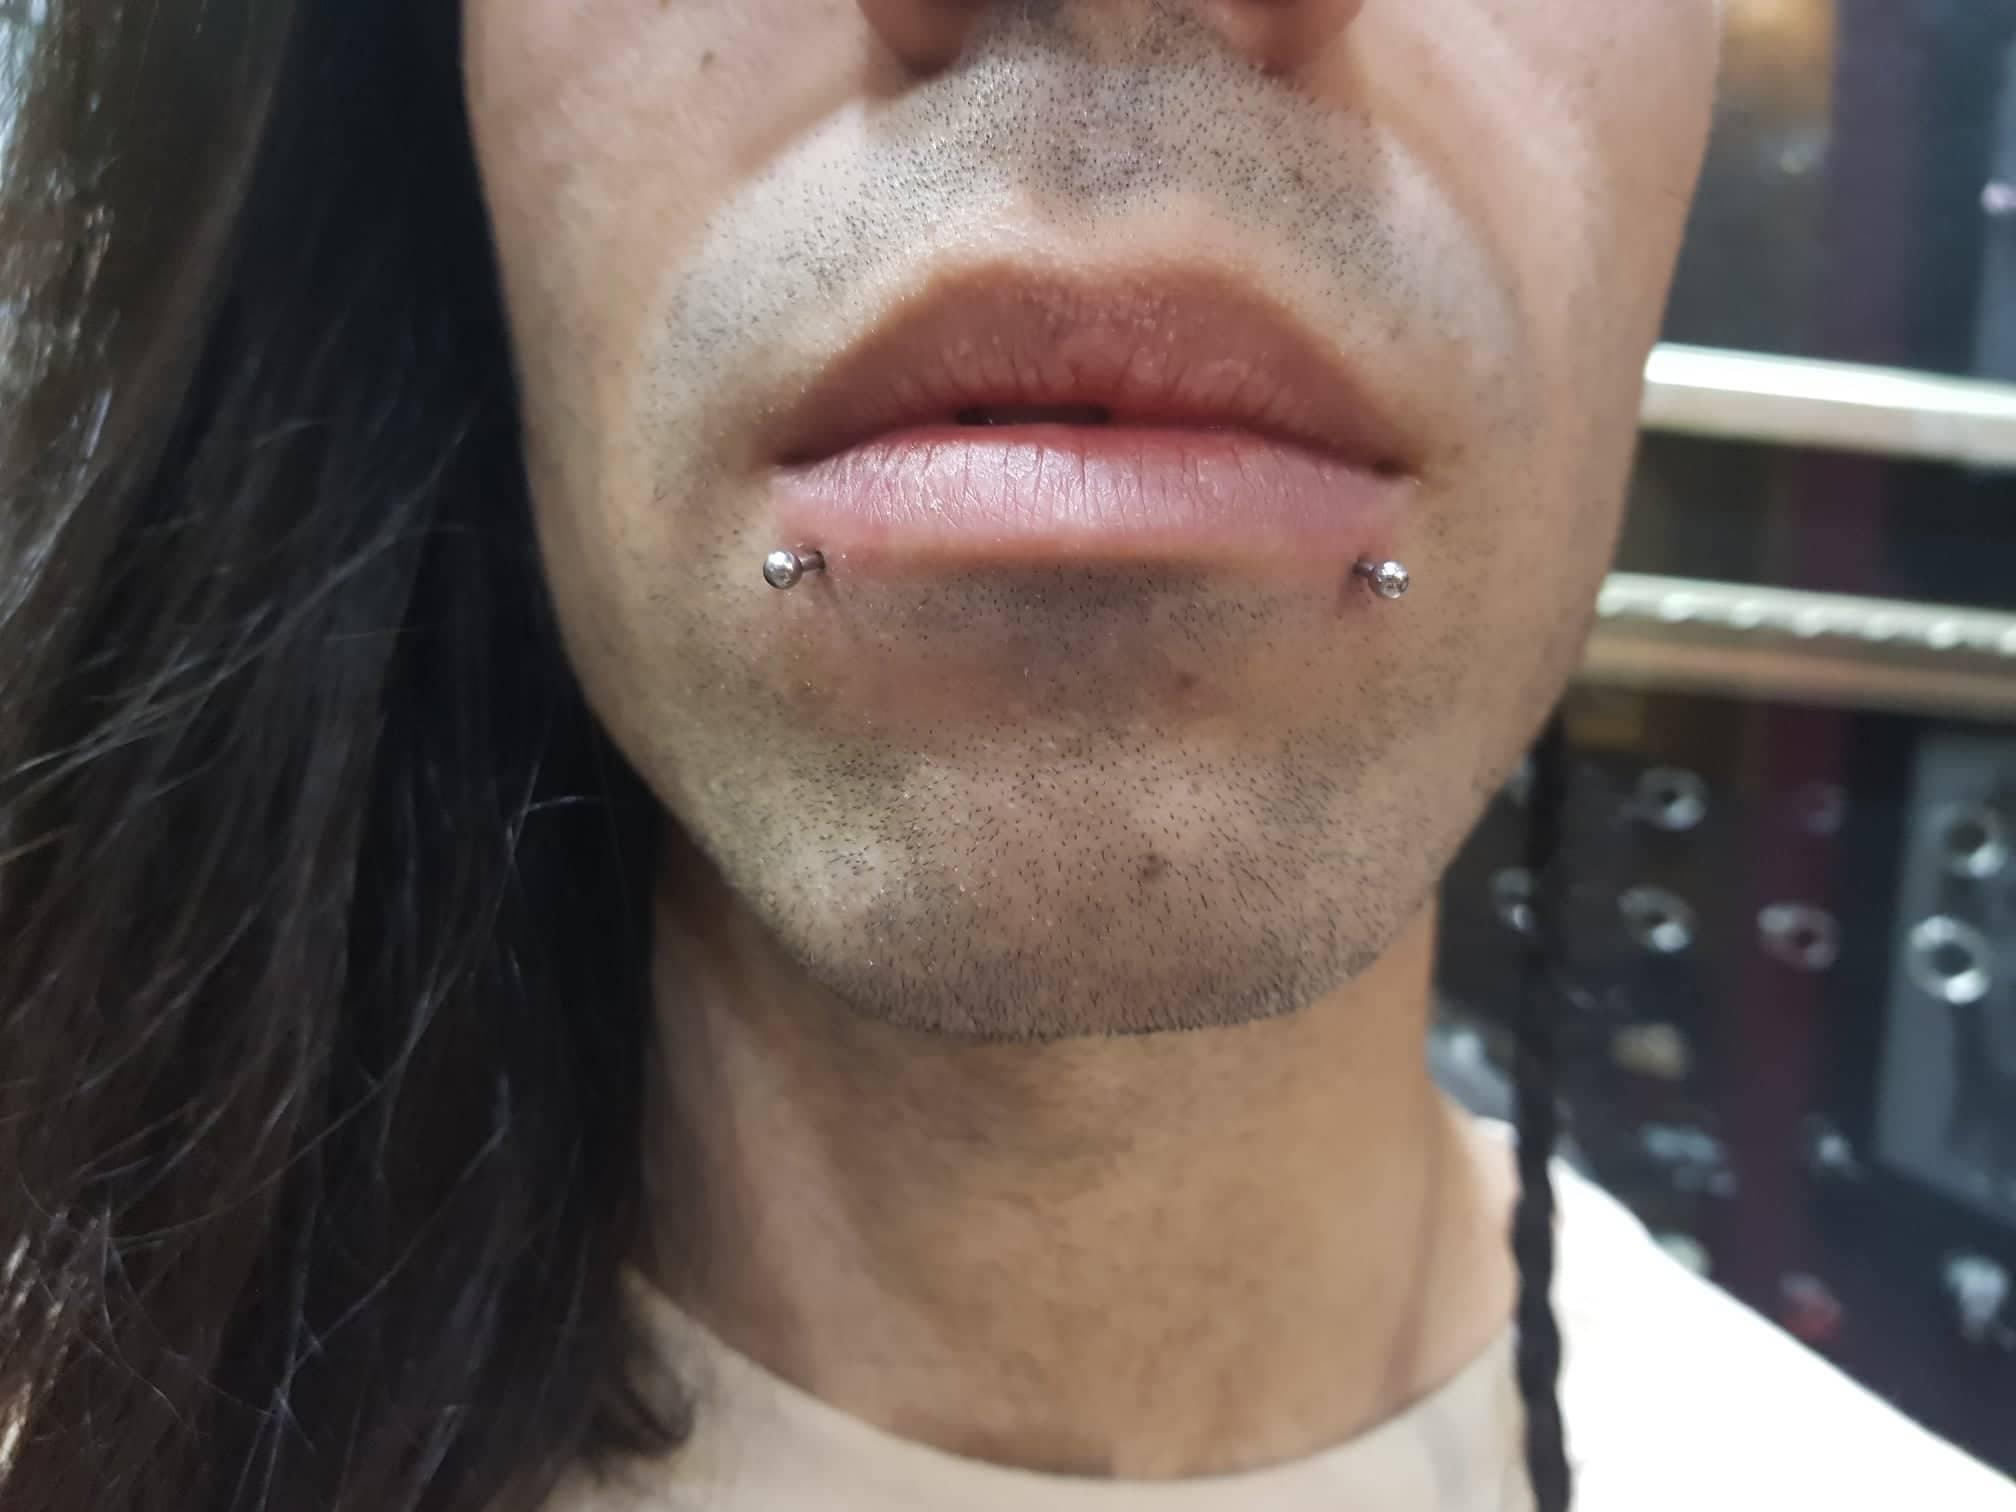 facial piercing